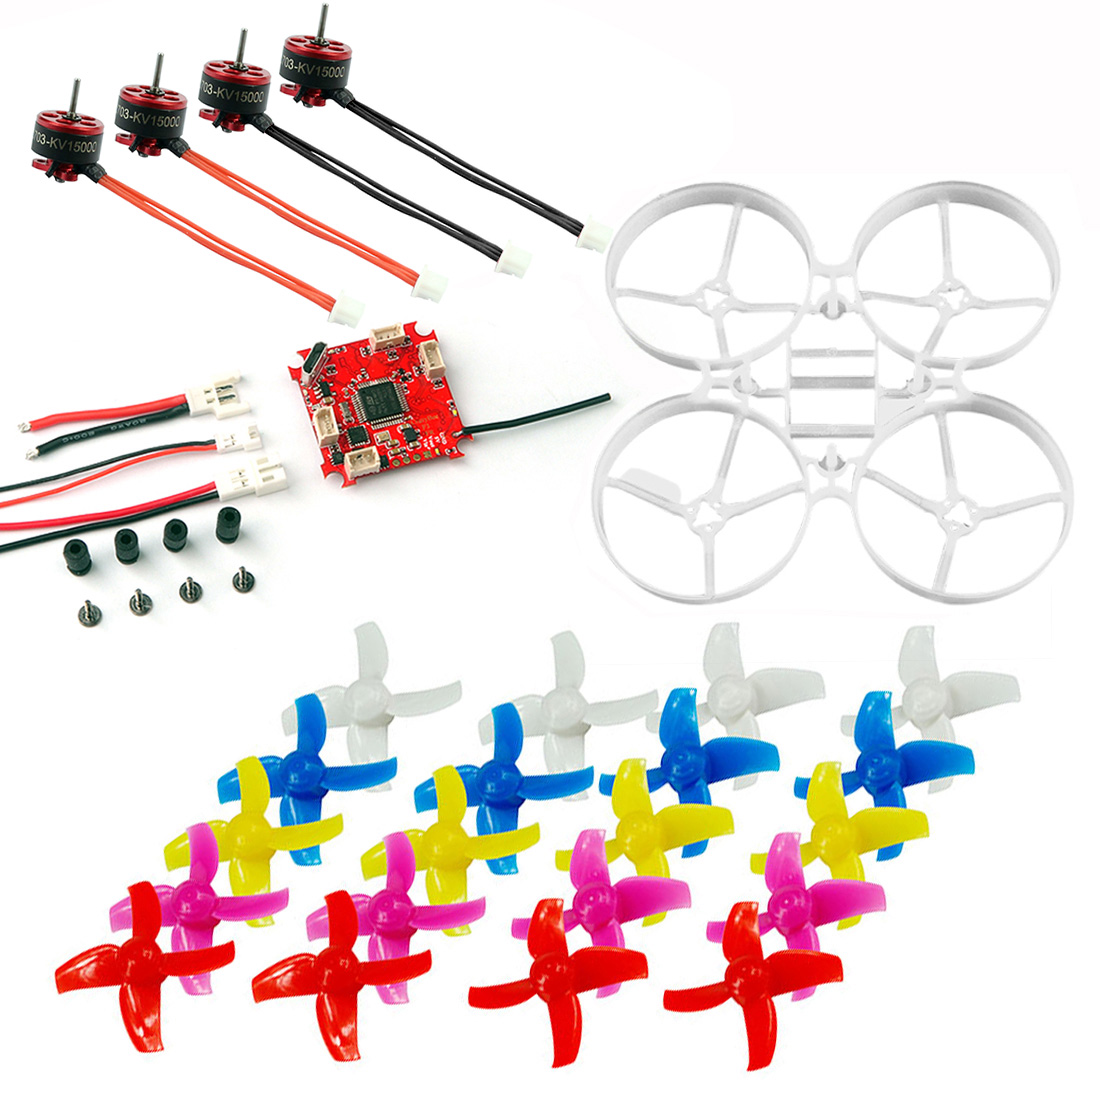 Bescheiden 75mm Innen Bwhoop Racer Drone Mini Rahmen Kit & Crazybee F3 Bürstenlosen Esc & Se0703 Motor & 40mm Propeller Sammeln & Seltenes